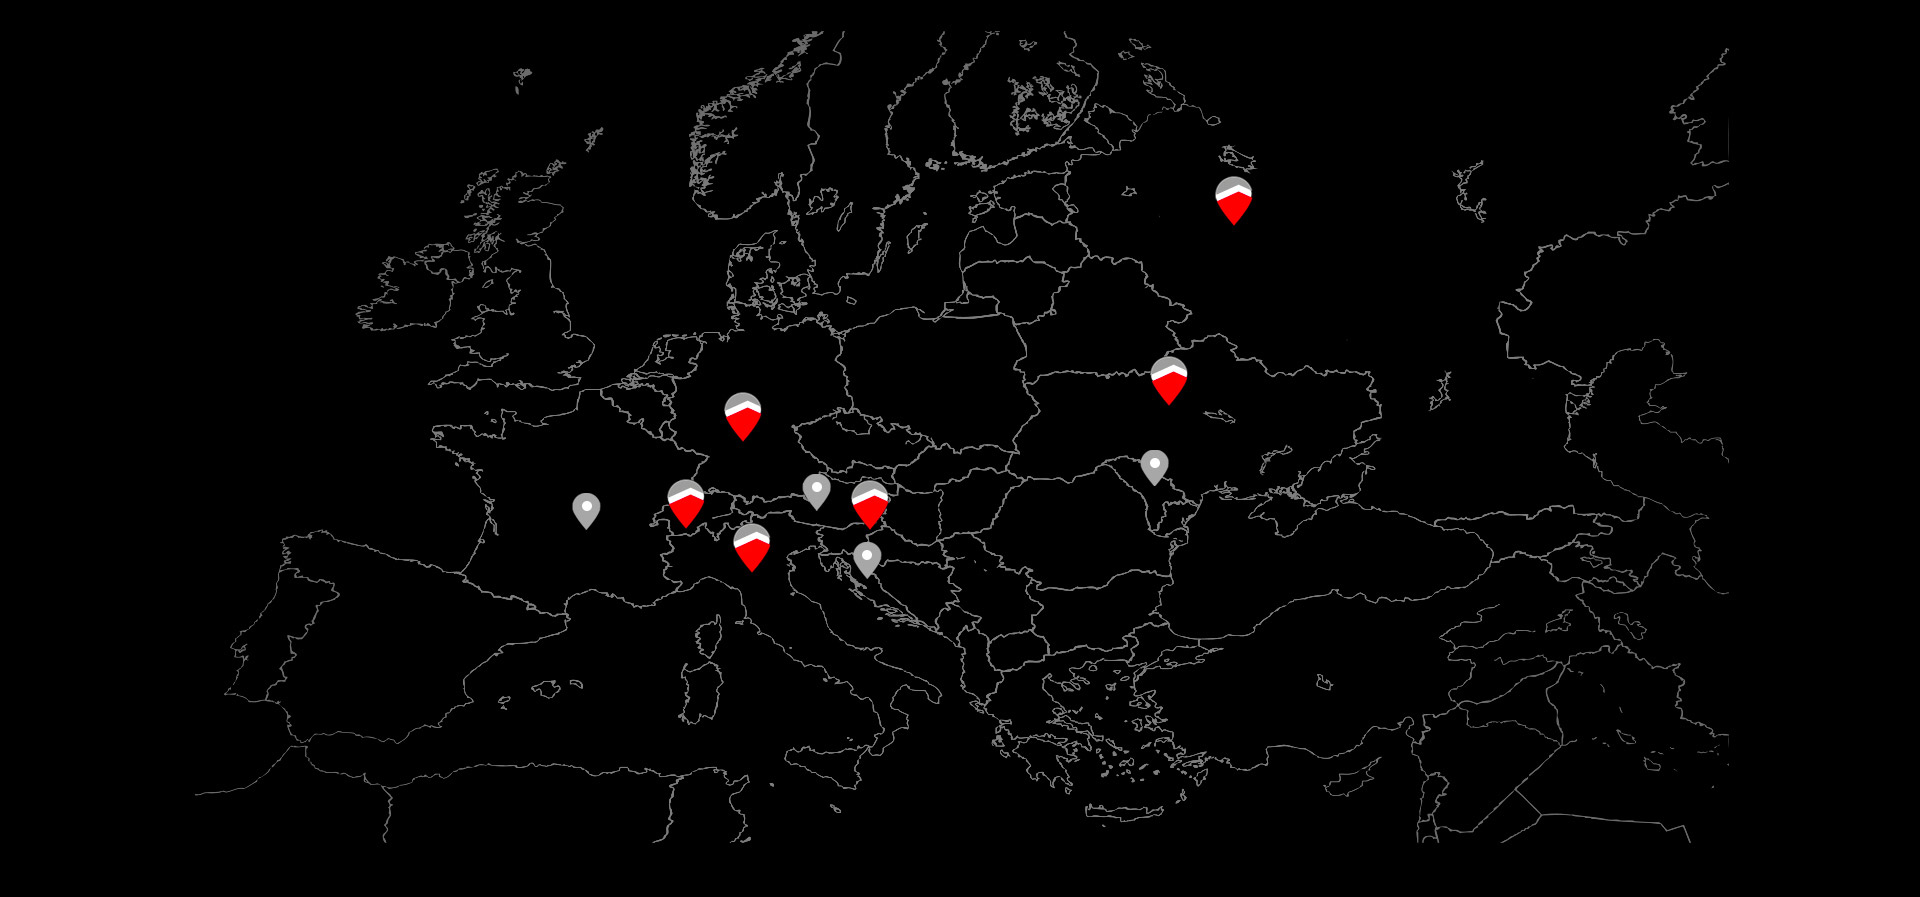 Mappa-paesi-mondo-Case-in-Legno-Gruppo-Kager